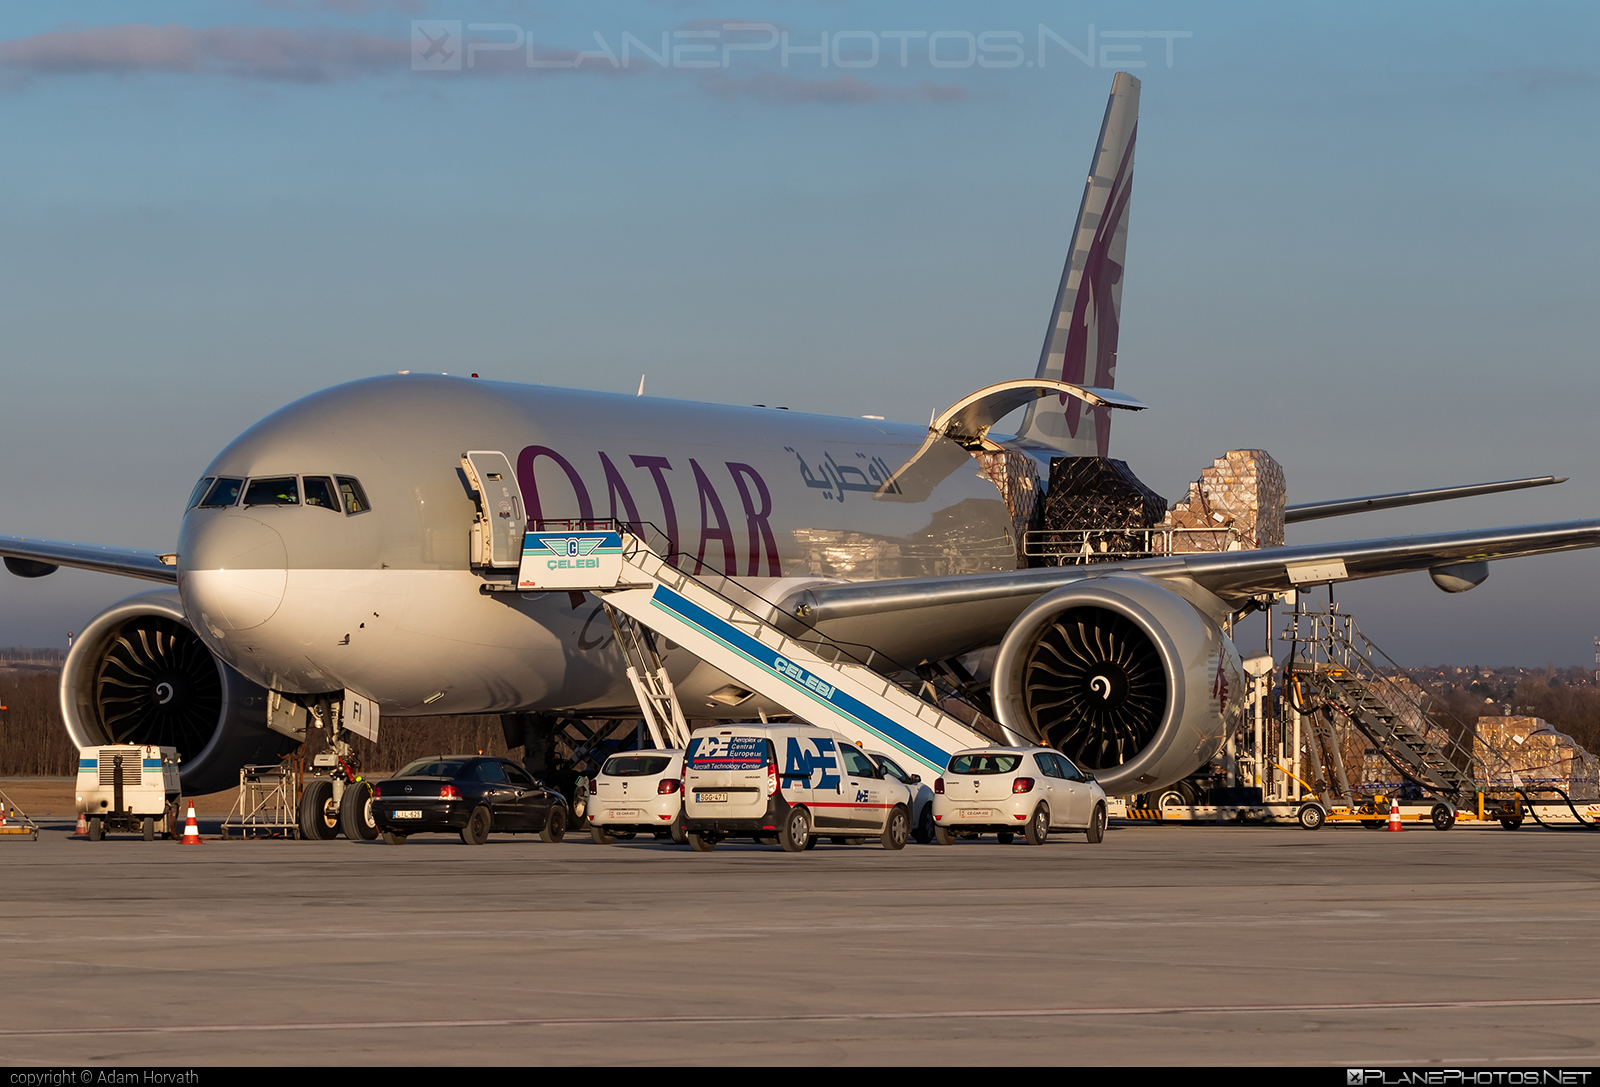 Boeing 777F - A7-BFI operated by Qatar Airways Cargo #b777 #b777f #b777freighter #boeing #boeing777 #qatarairwayscargo #tripleseven